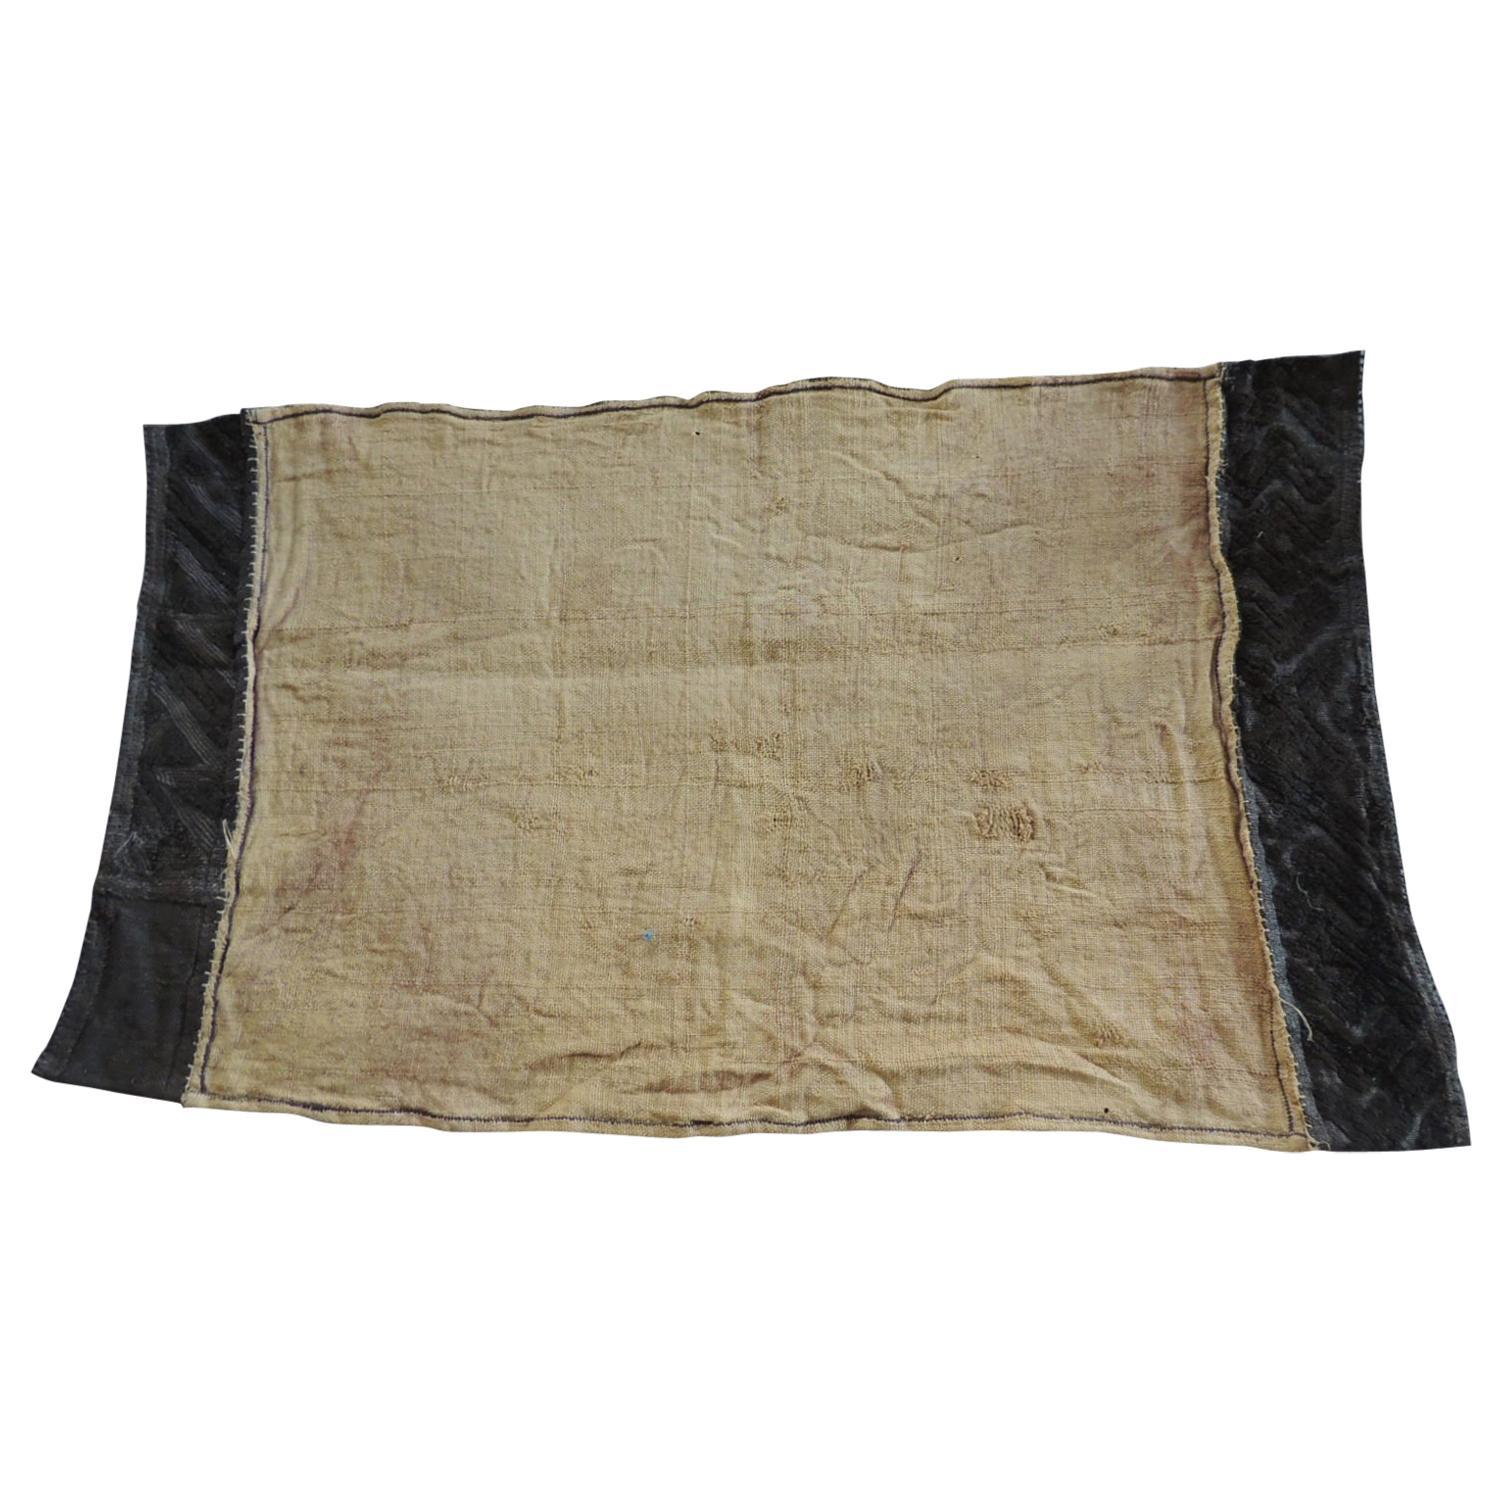 Vintage Natural and Black African Kuba Applique Textile